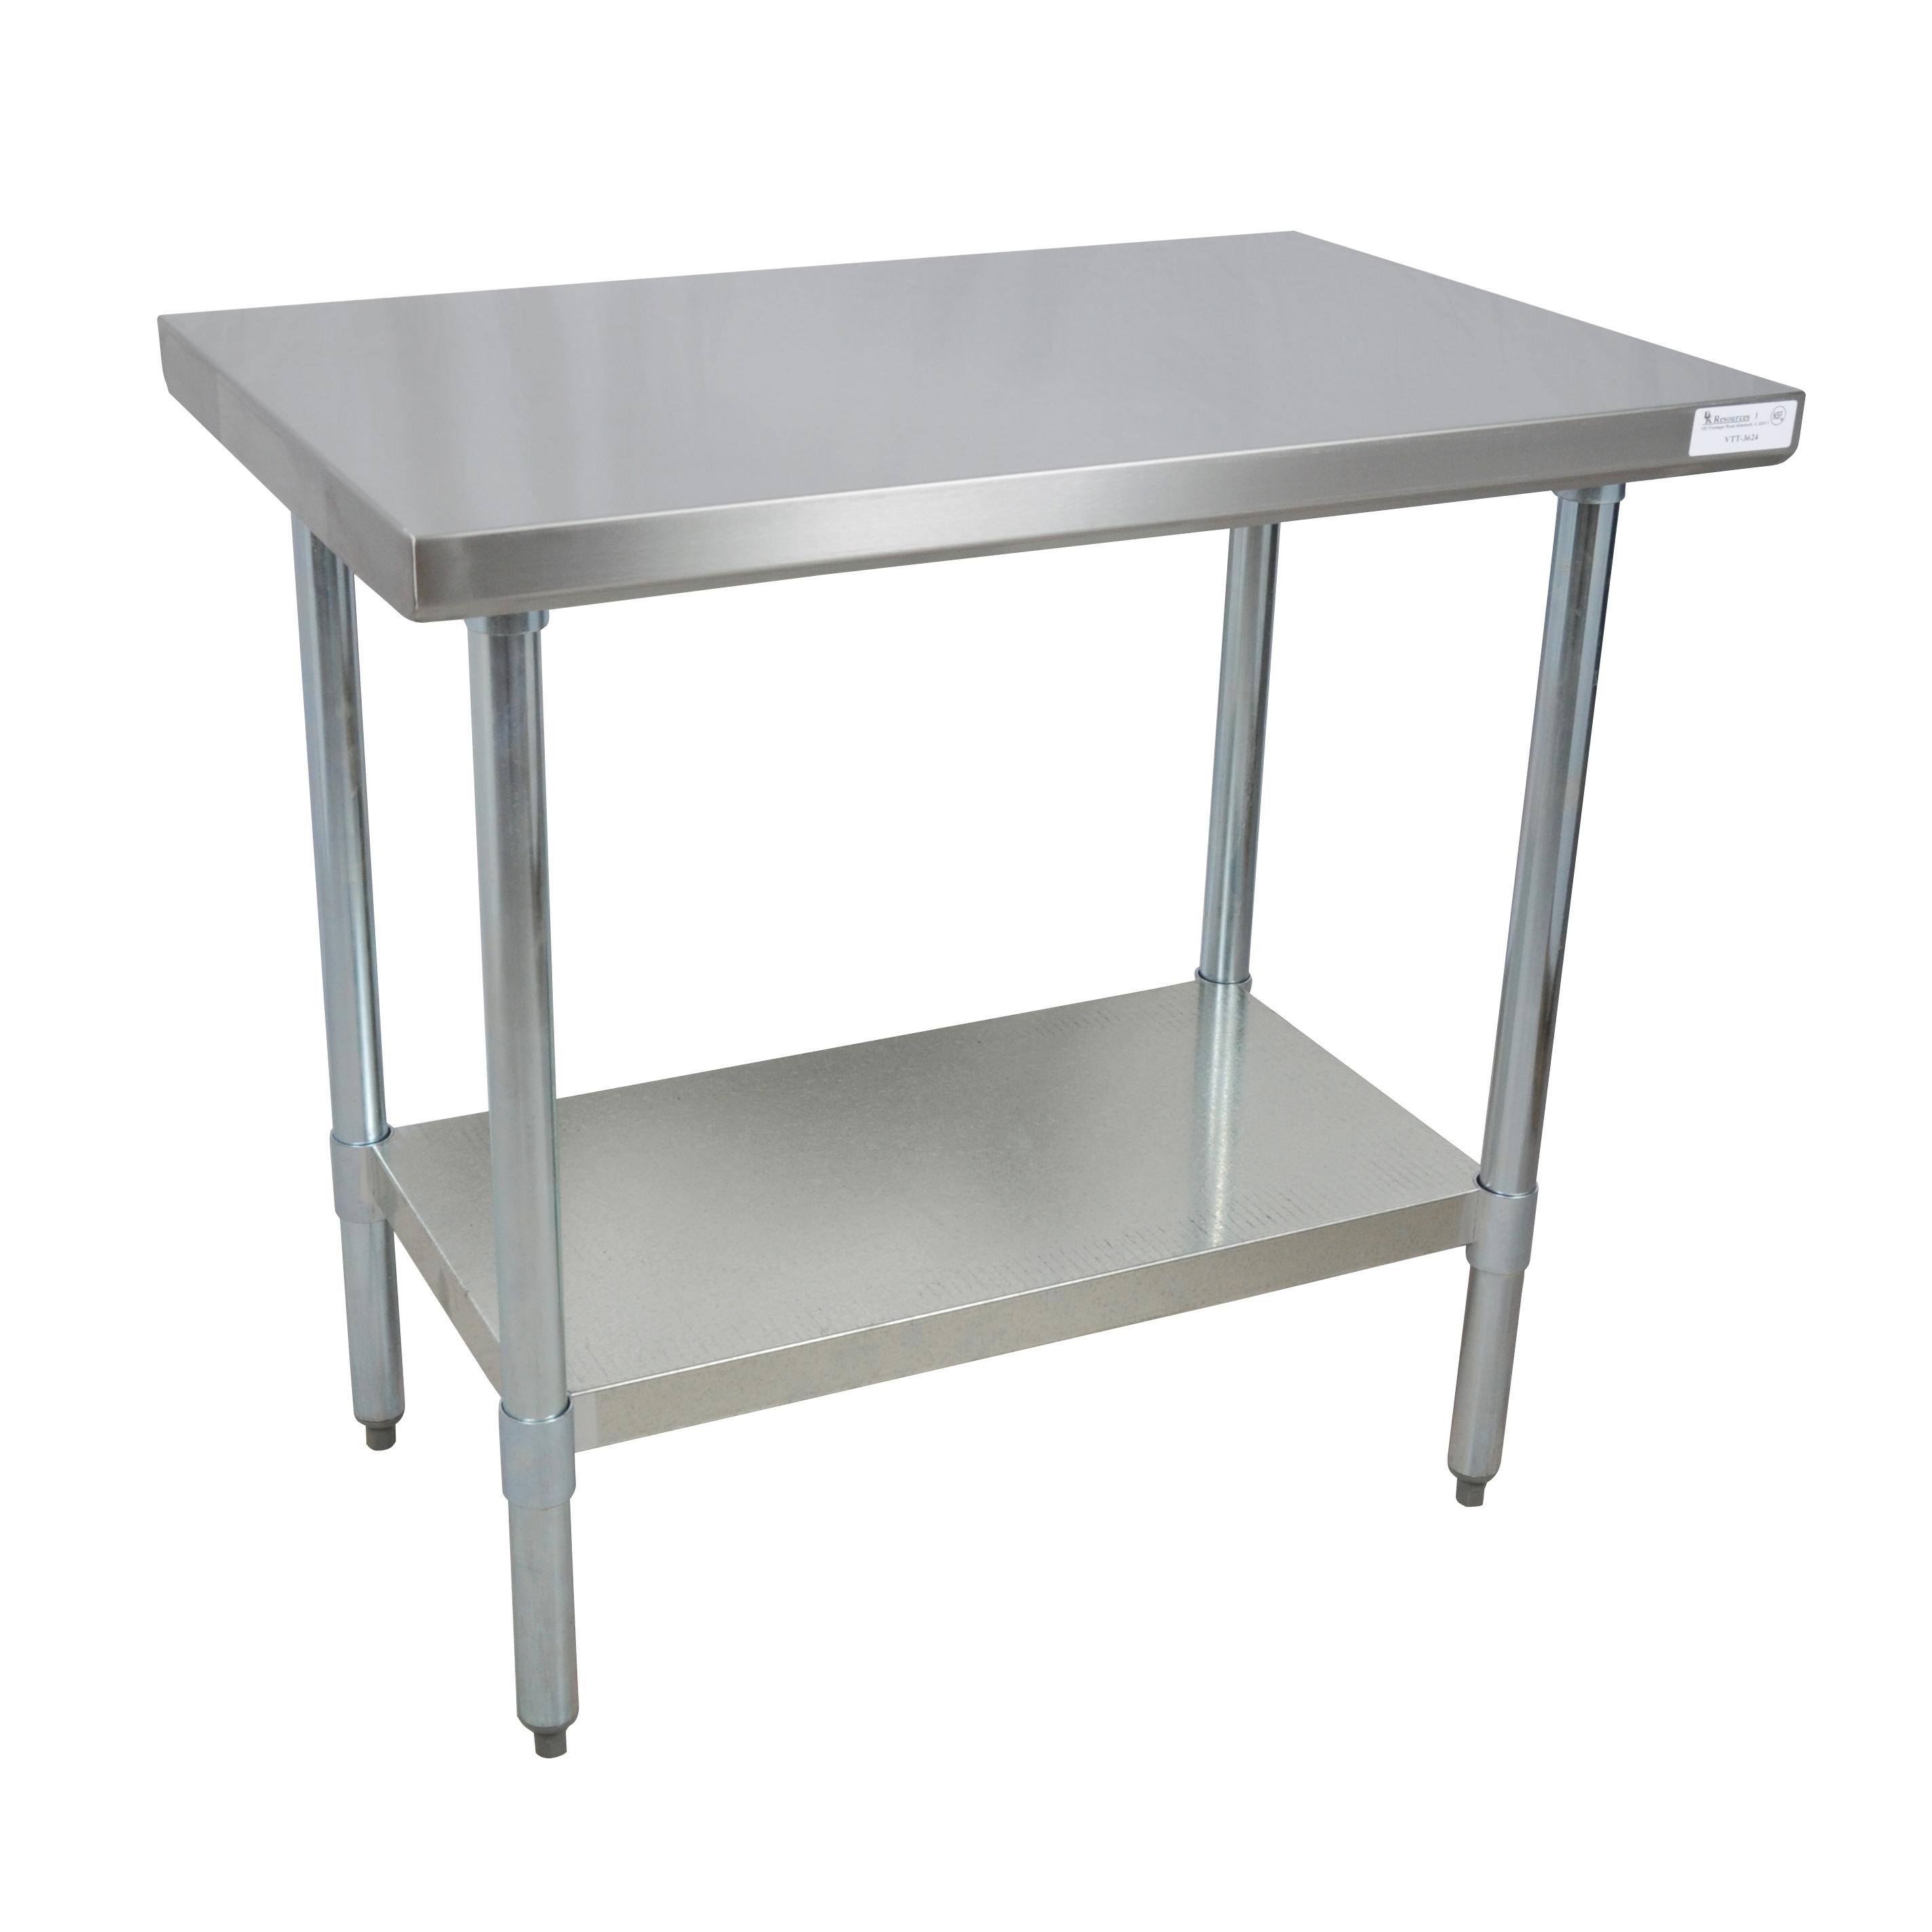 BK Resources CTT-3636 work table,  36